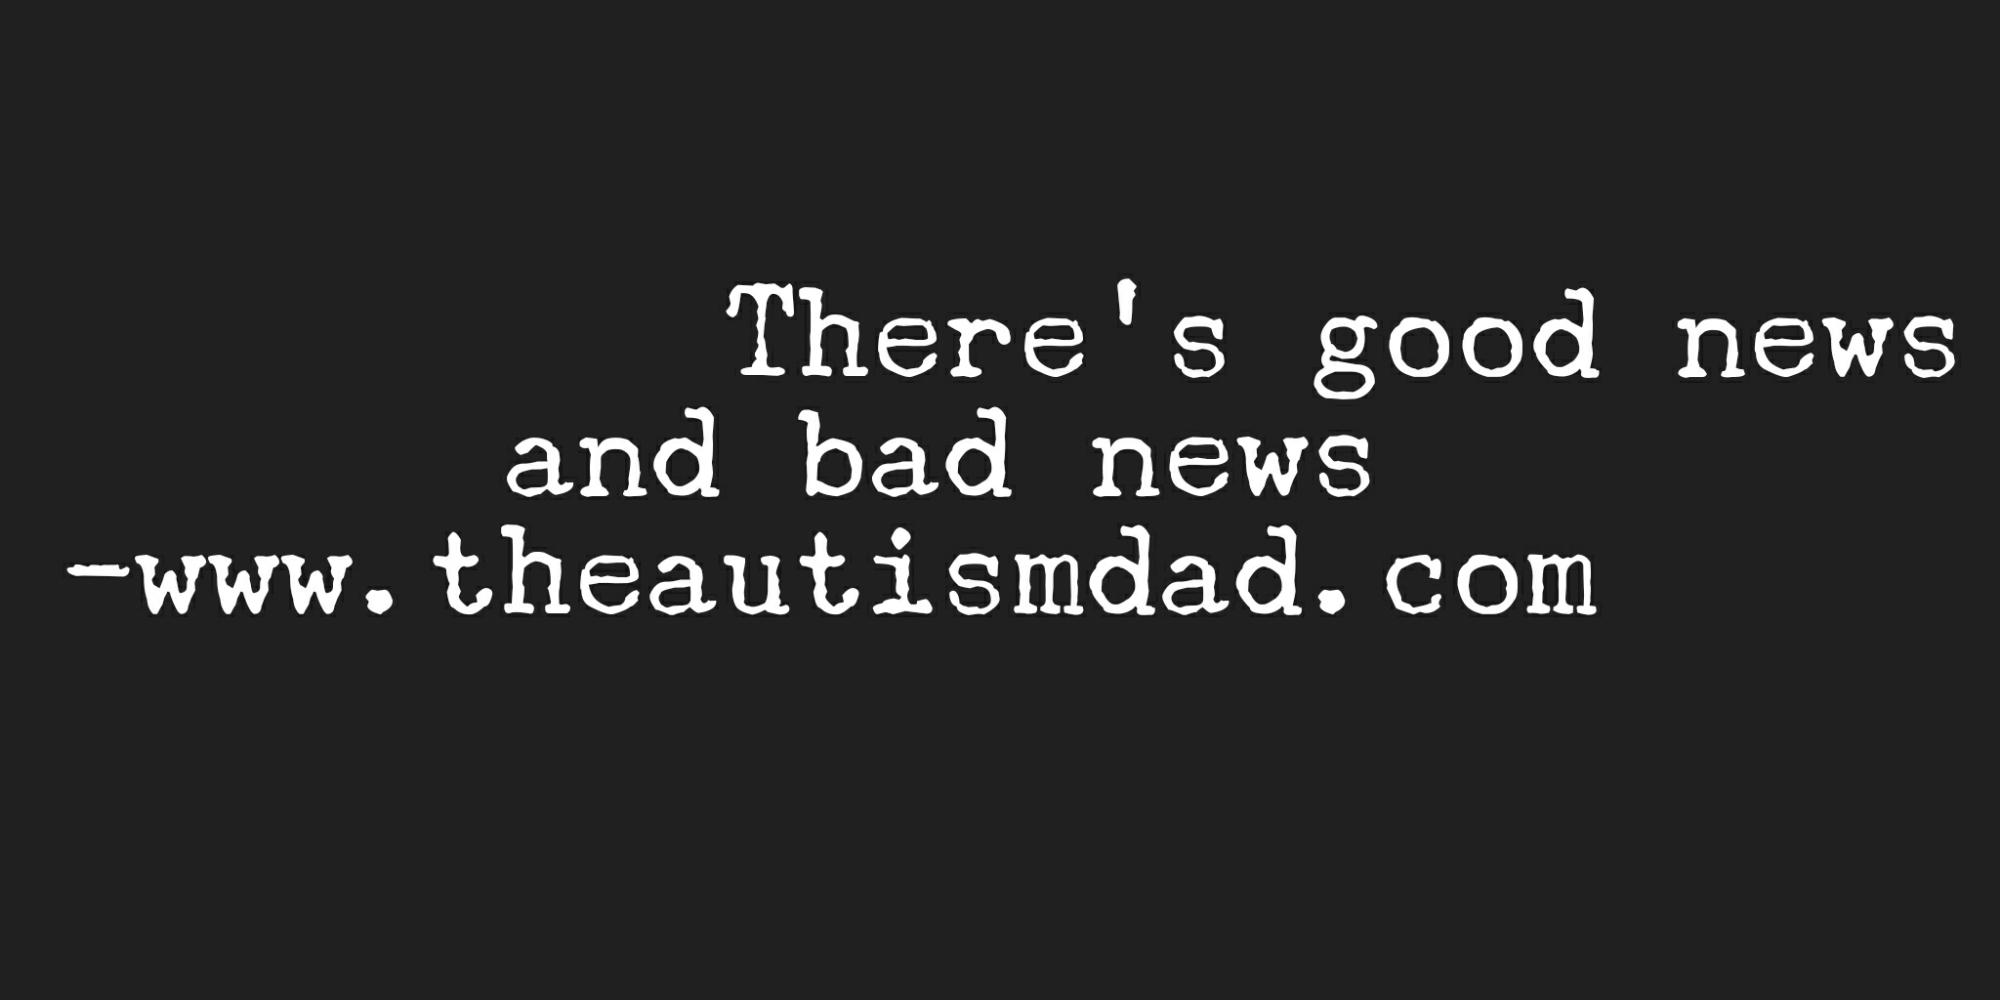 There's good news and bad news